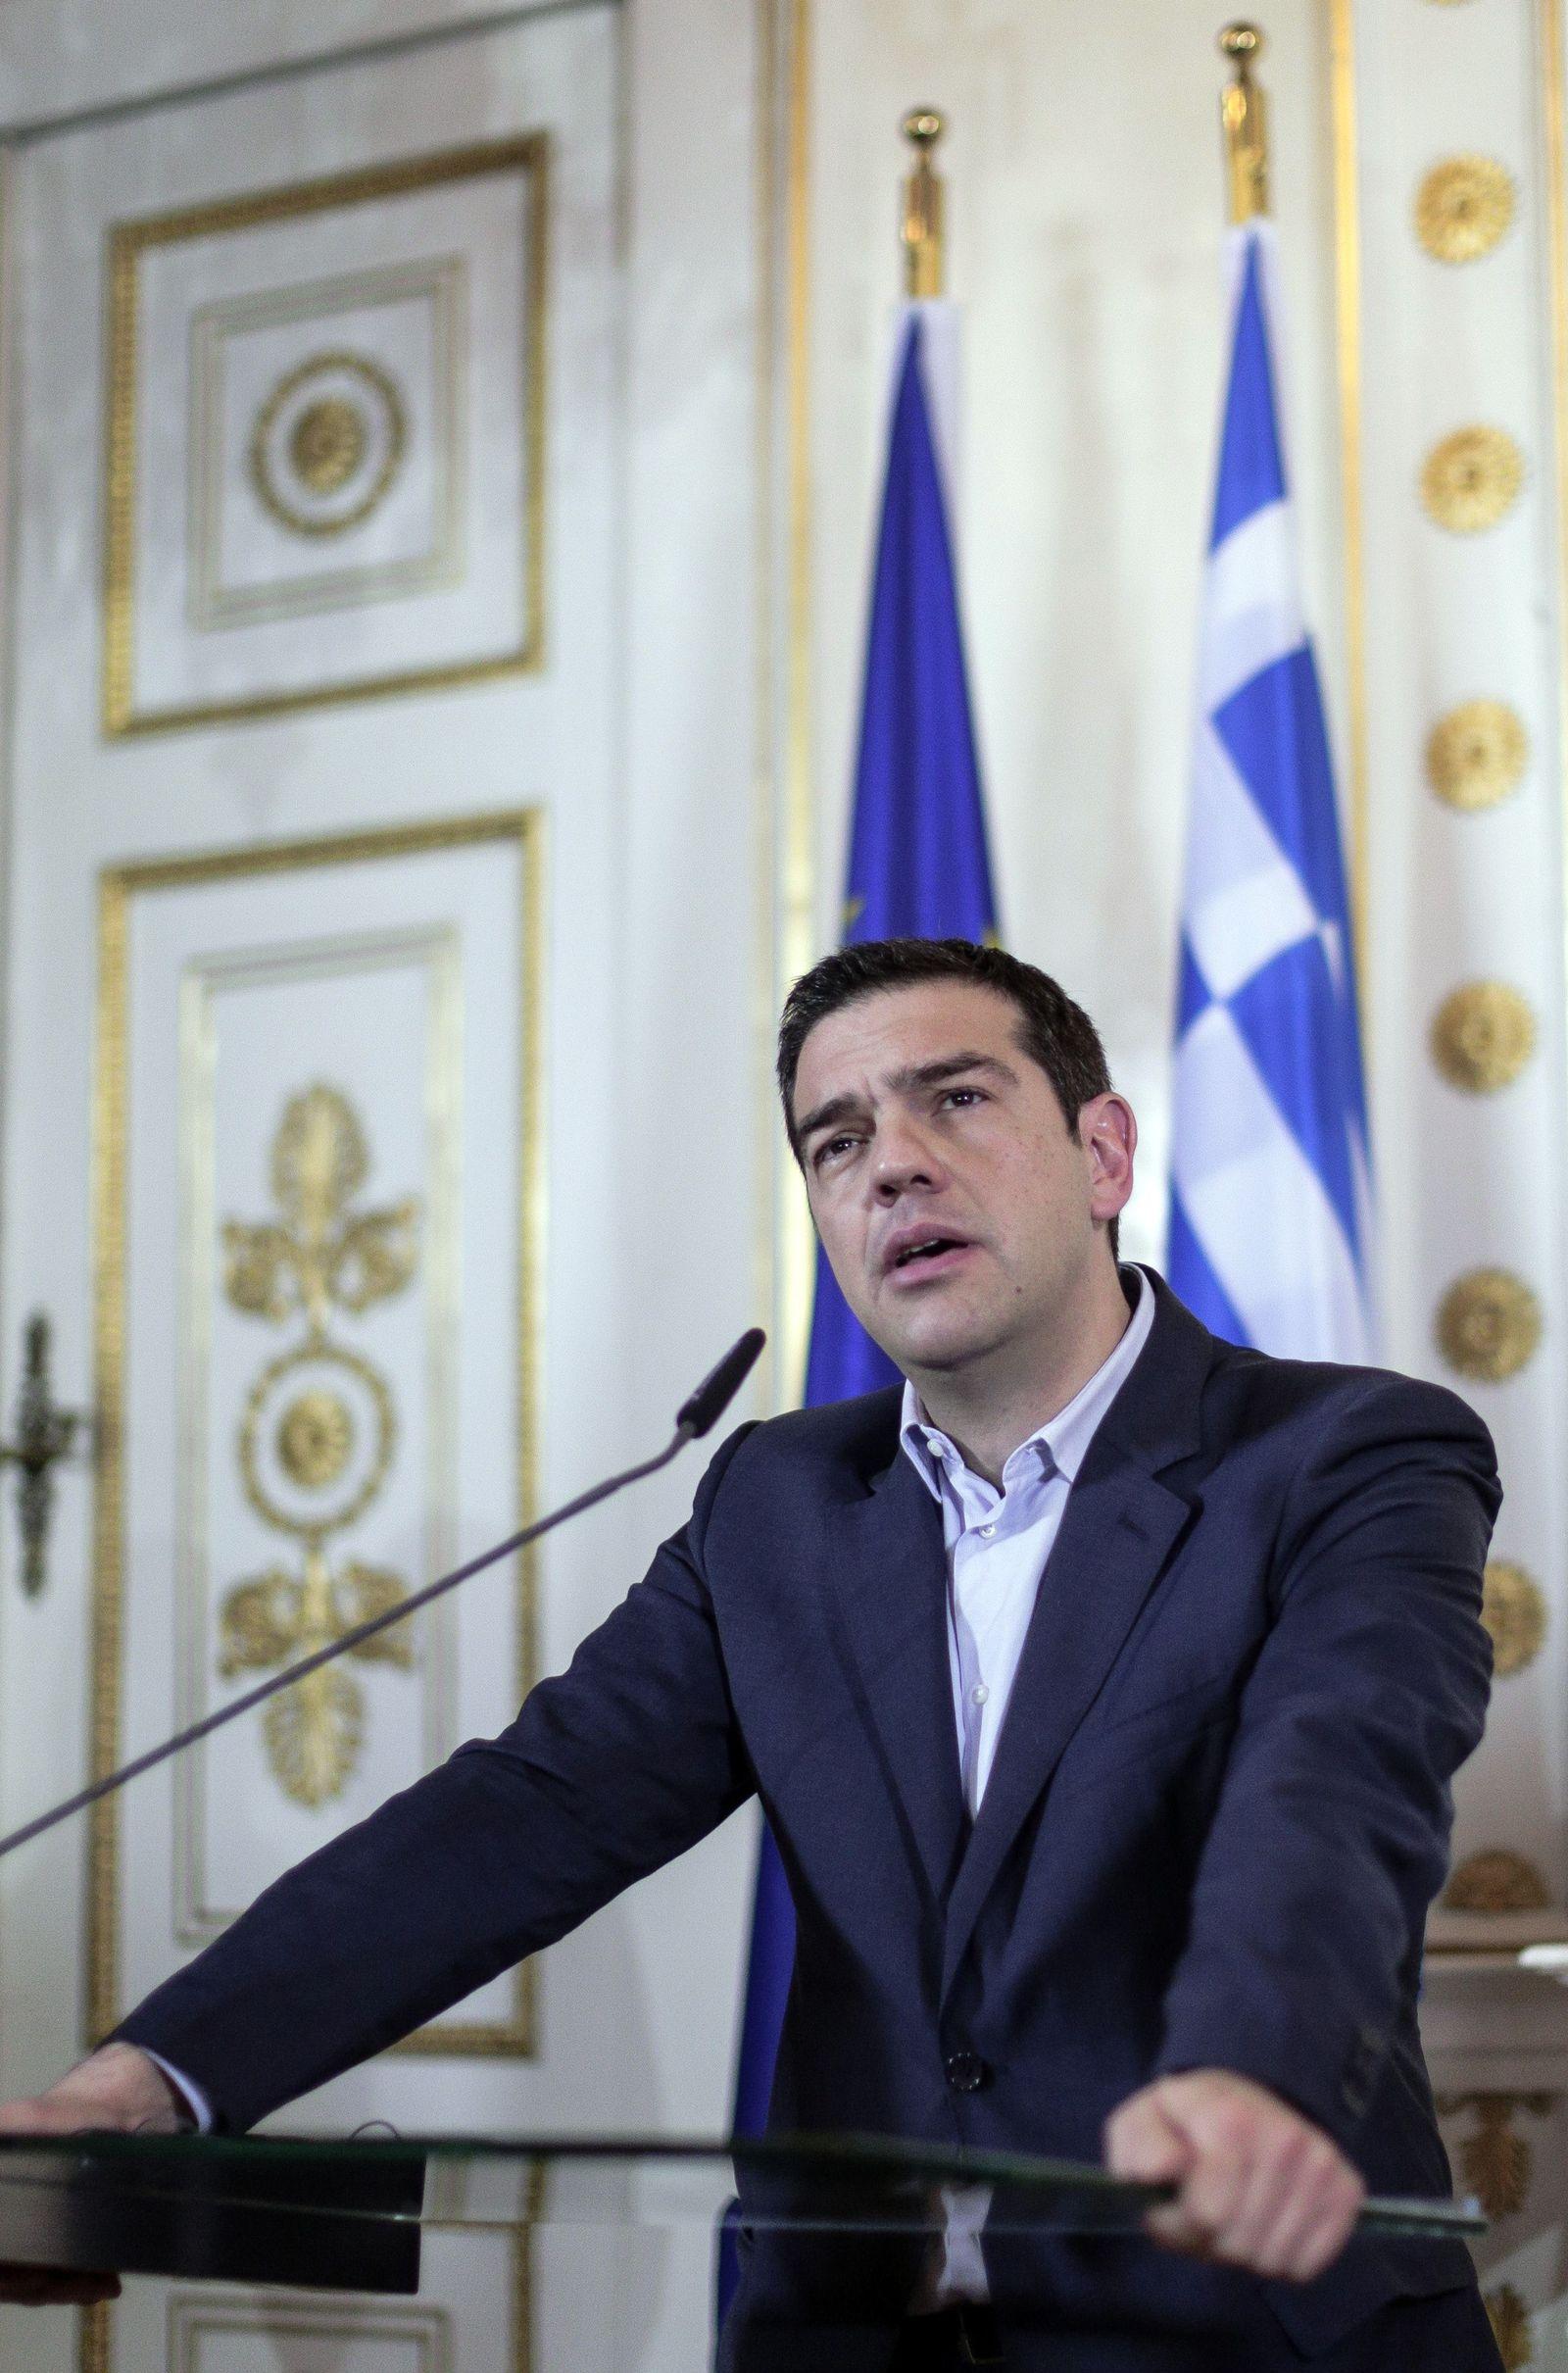 AUSTRIA-GREECE-POLITICS-DIPLOMACY